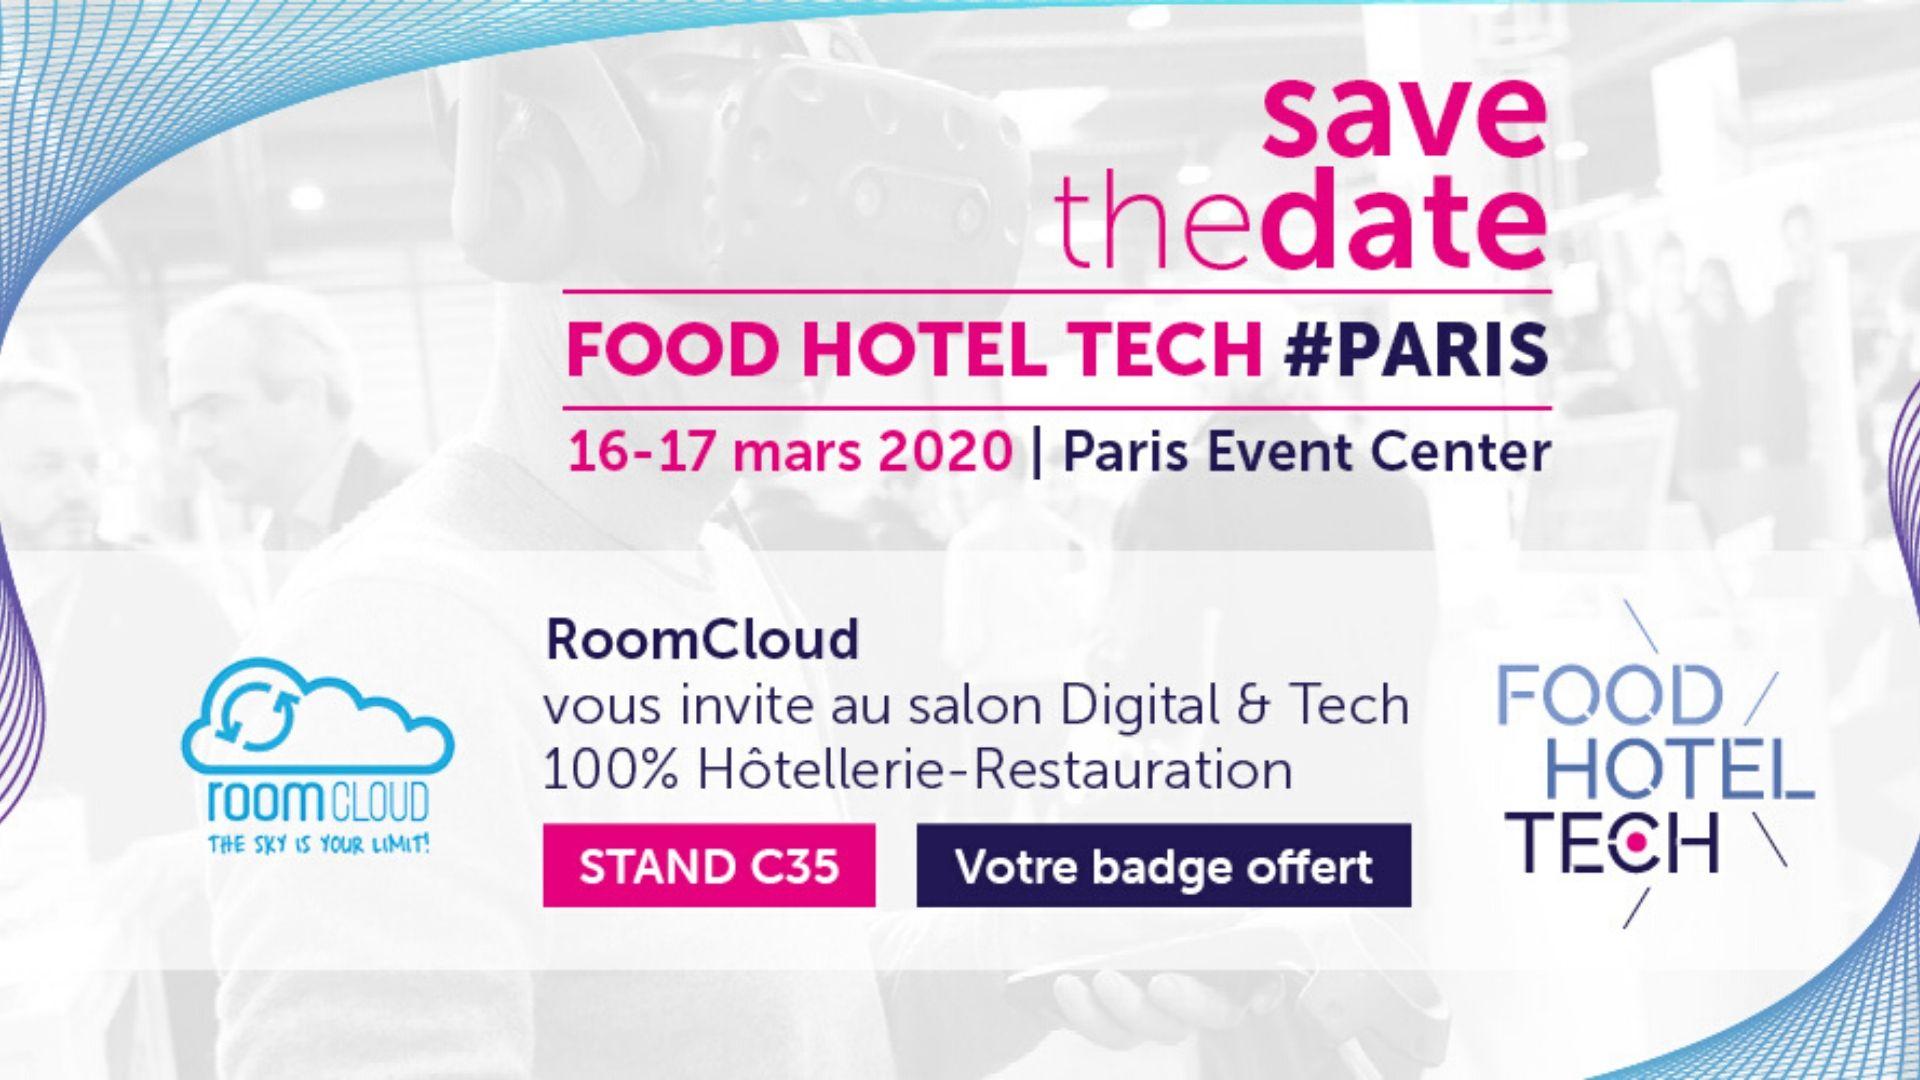 Roomcloud vuelve a Food Hotel Tech Paris